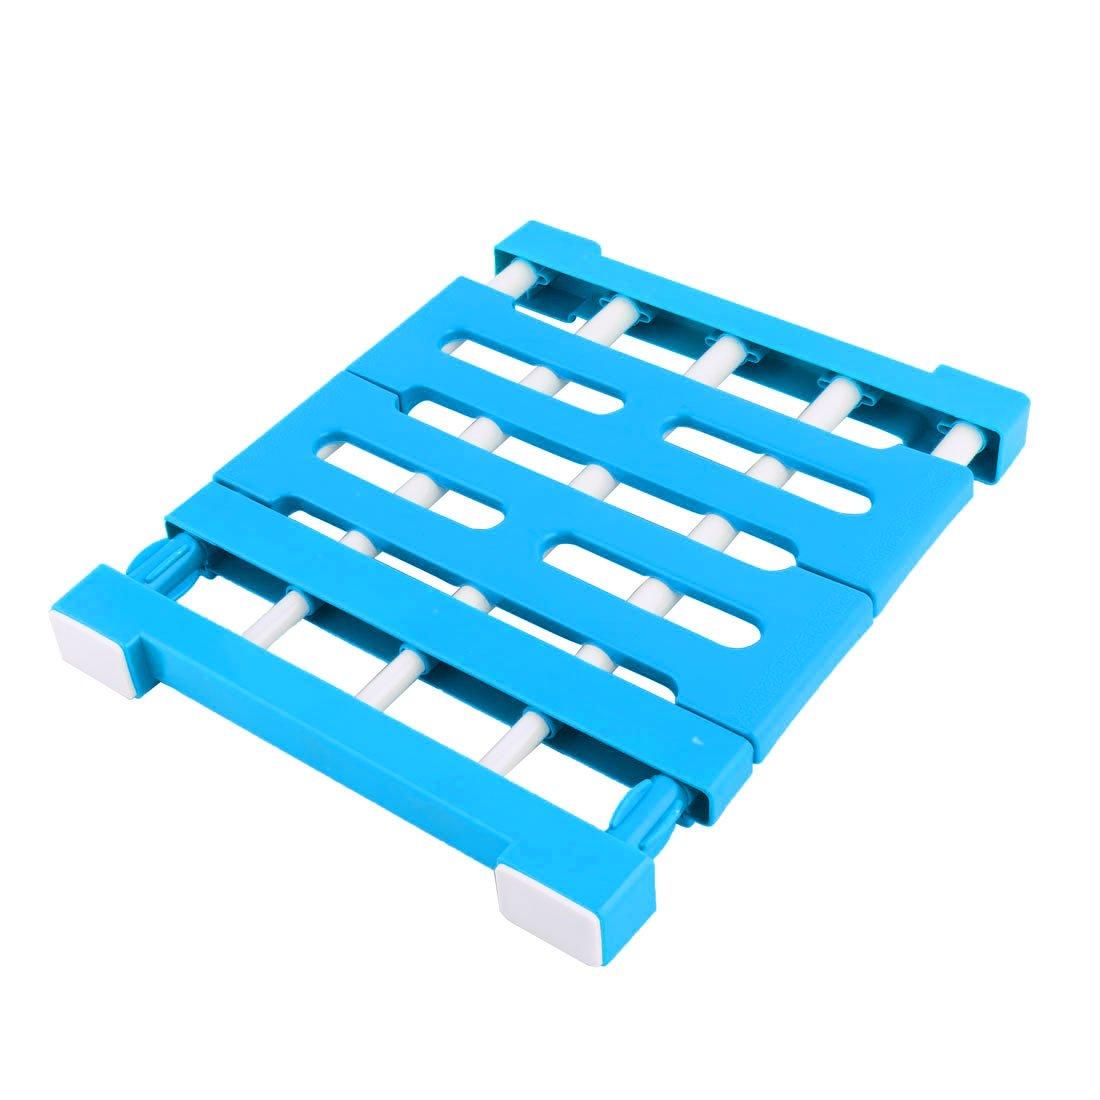 sourcingmap® Blau Hause Plastik ausziehbar Nagelfrei Diverses Lagerung Regal Trennwand a17030900ux0128